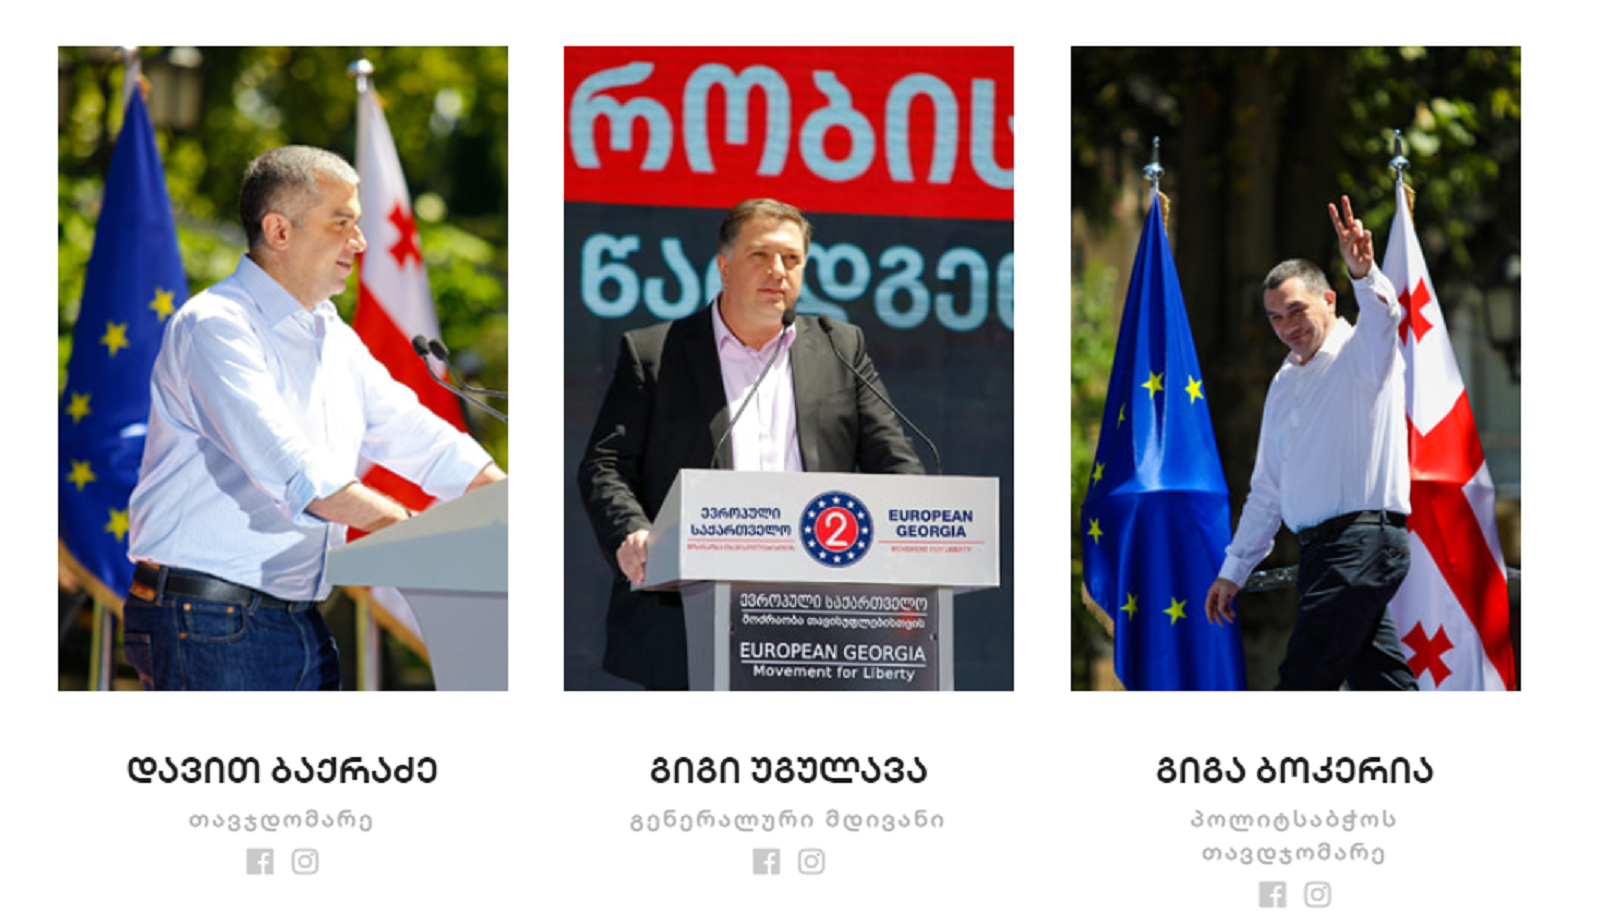 329085252 #политика featured, Гига Бокерия, Гиги Угулава, Давид Бакрадзе, Европейская Грузия, Зураб Чиаберашвили, Элене Хоштария